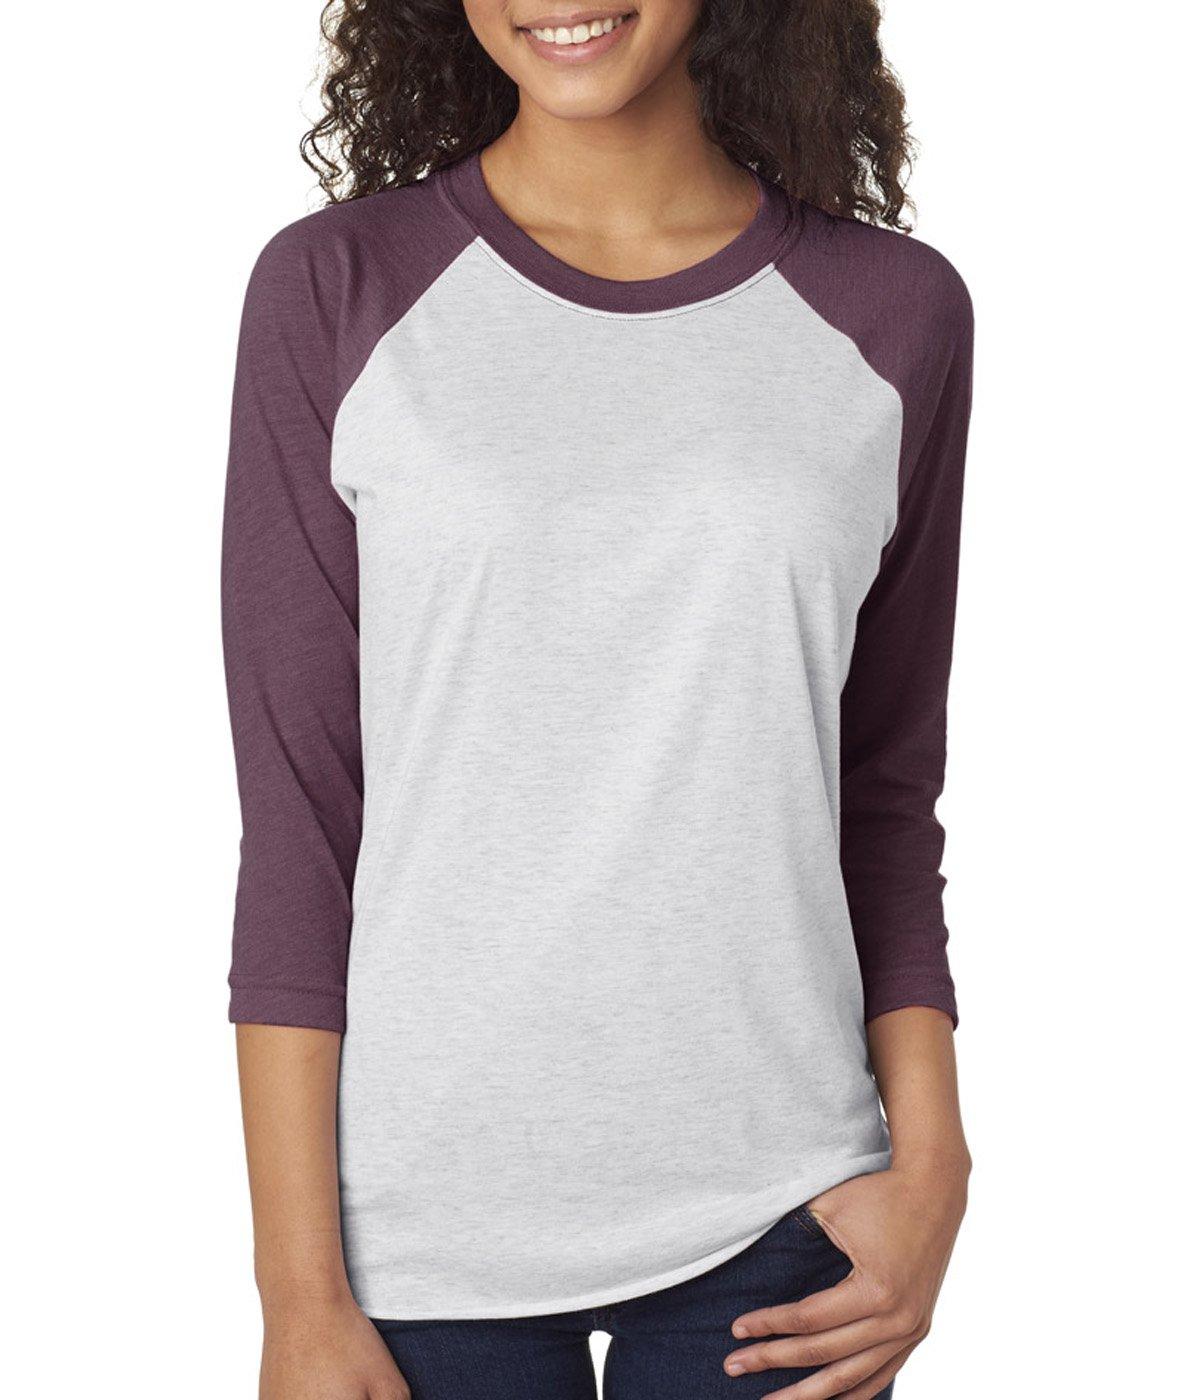 Next Level 6051 - Vintage Purple/Heather White-Large